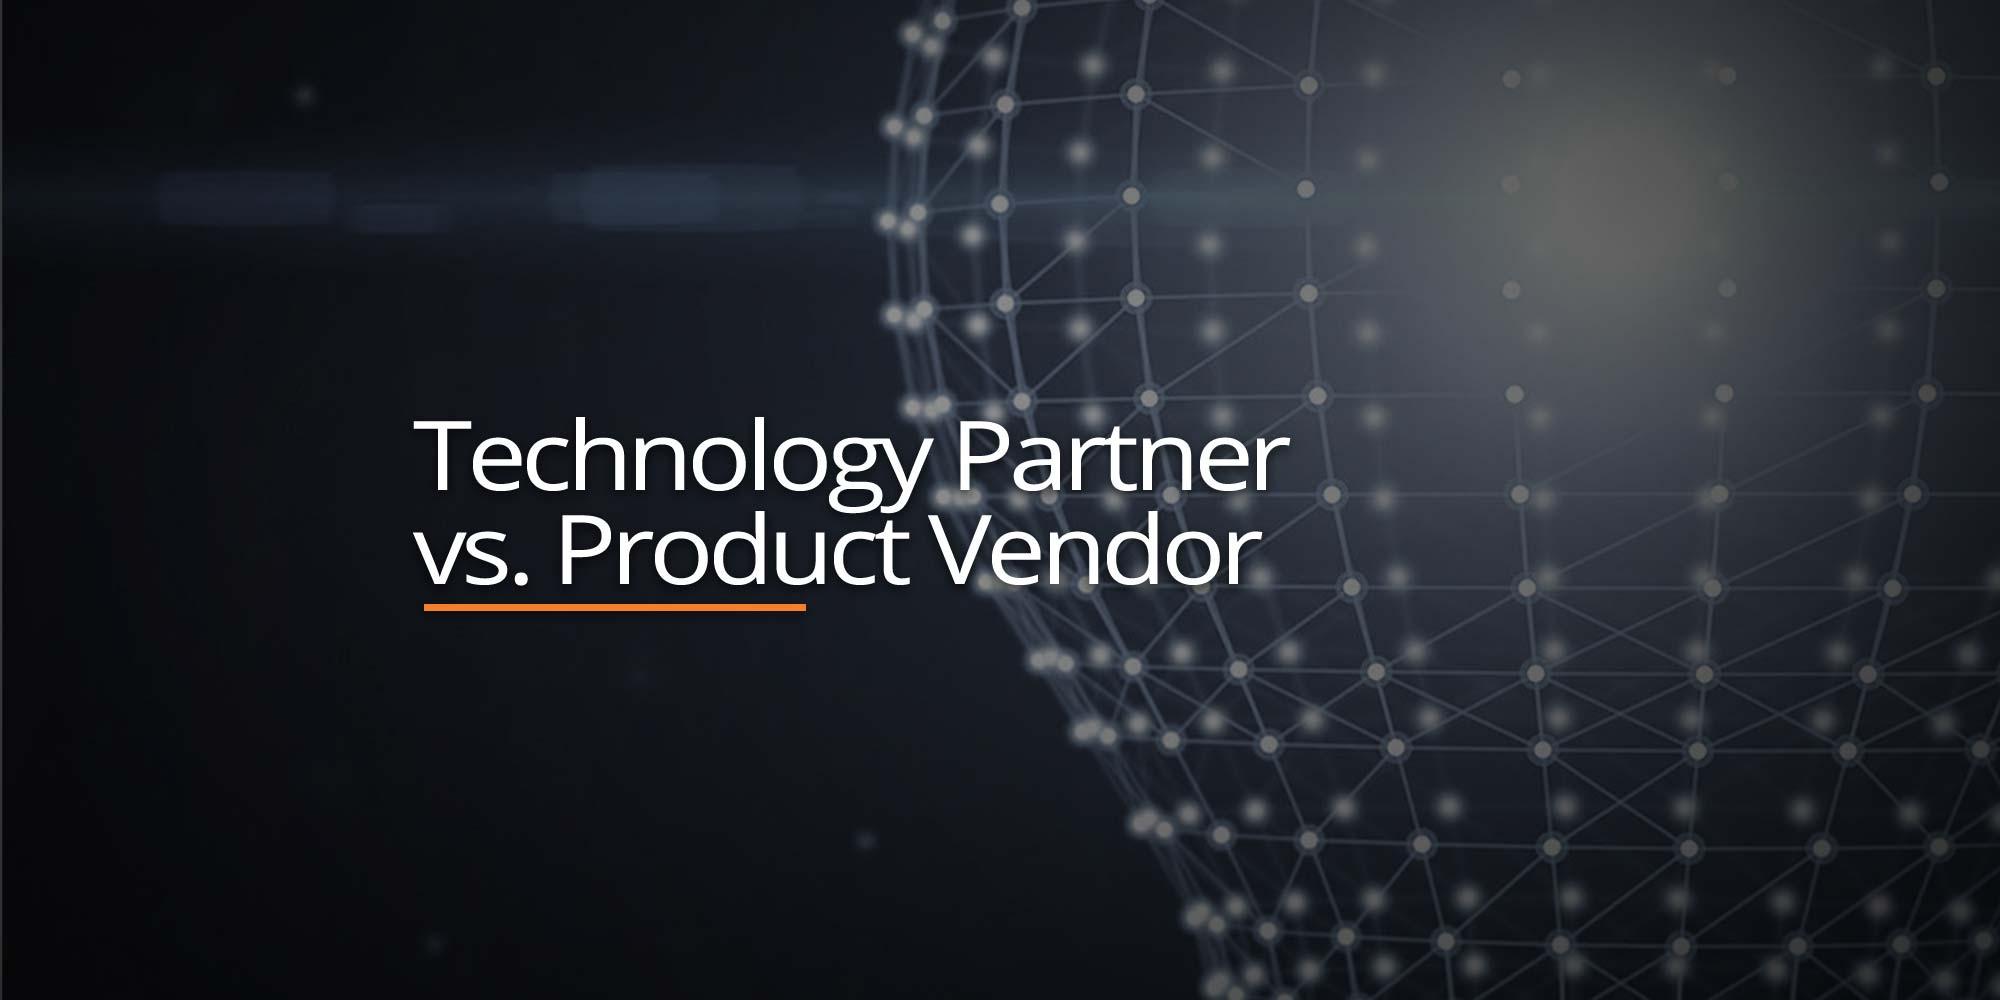 Technology Partner vs. Product Vendor